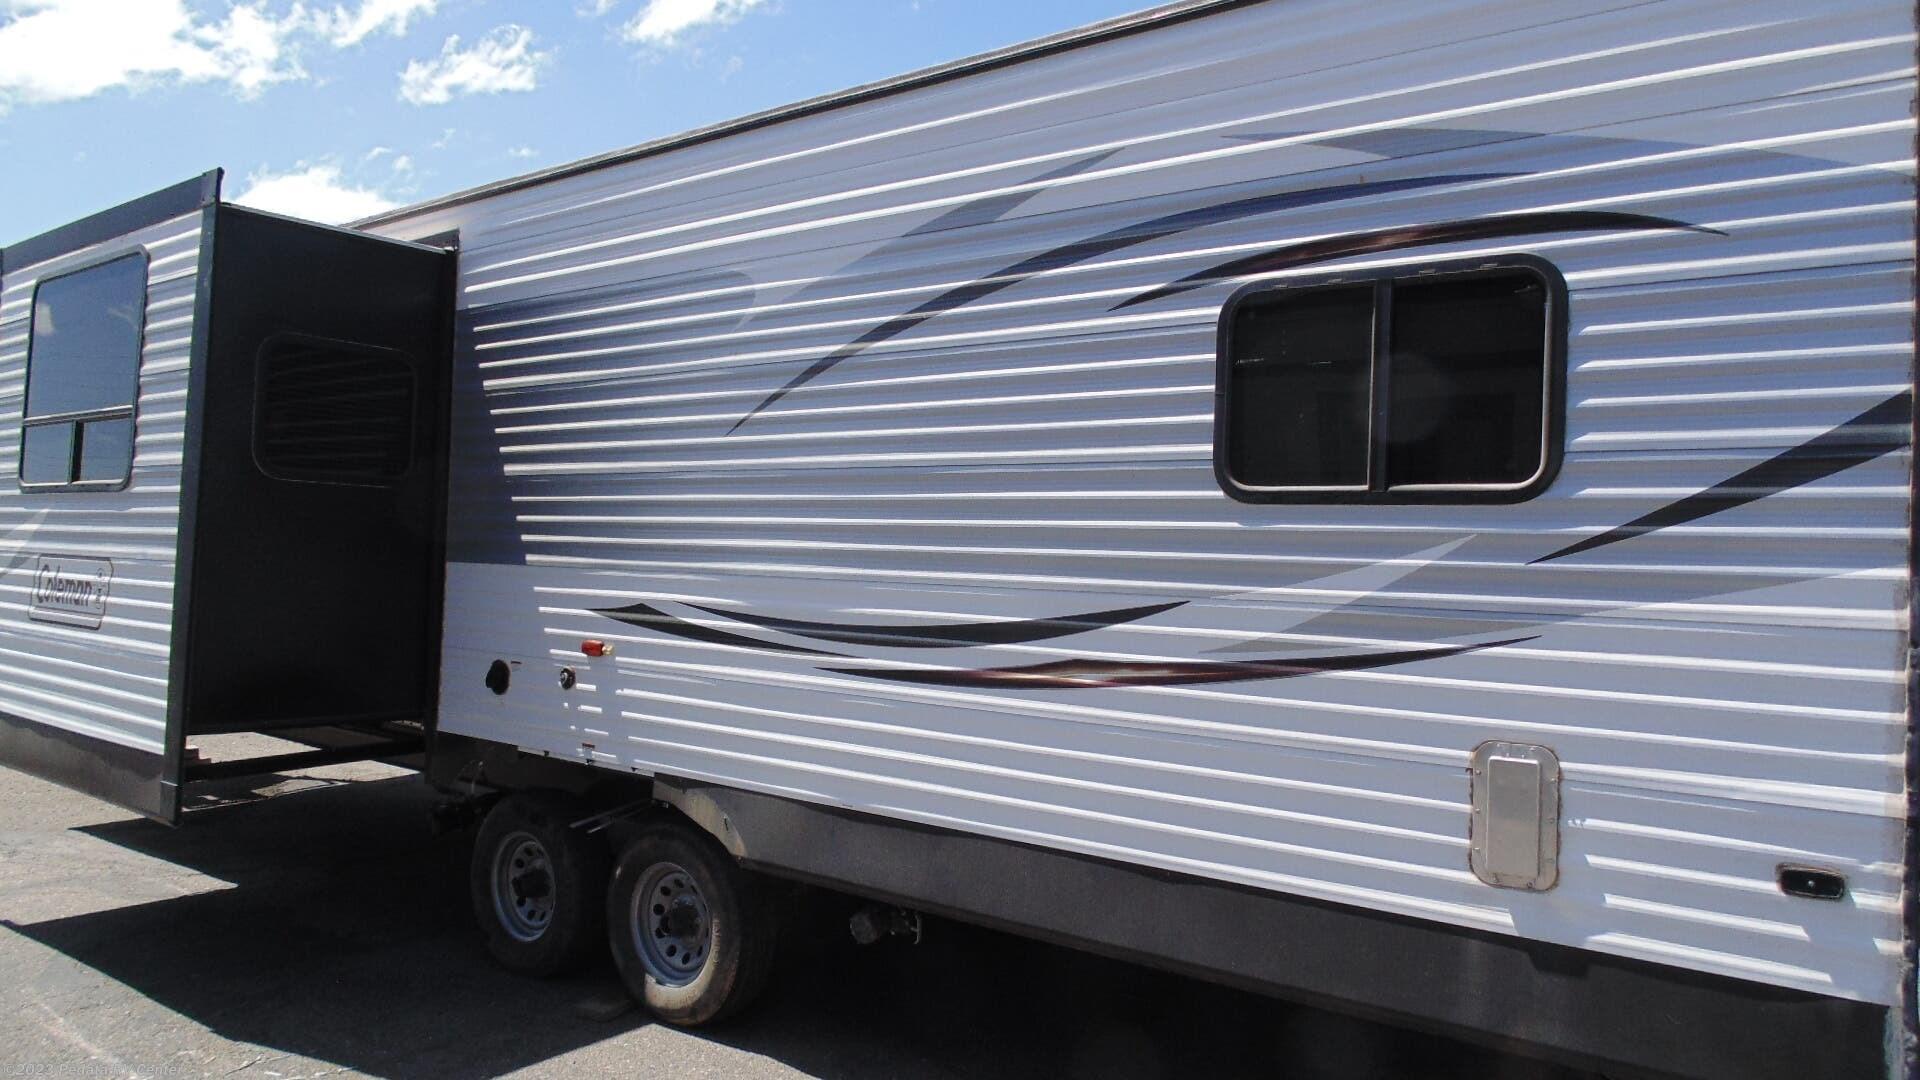 2017 Coleman Rv Lantern 300tq W 1sld For Sale In Tucson